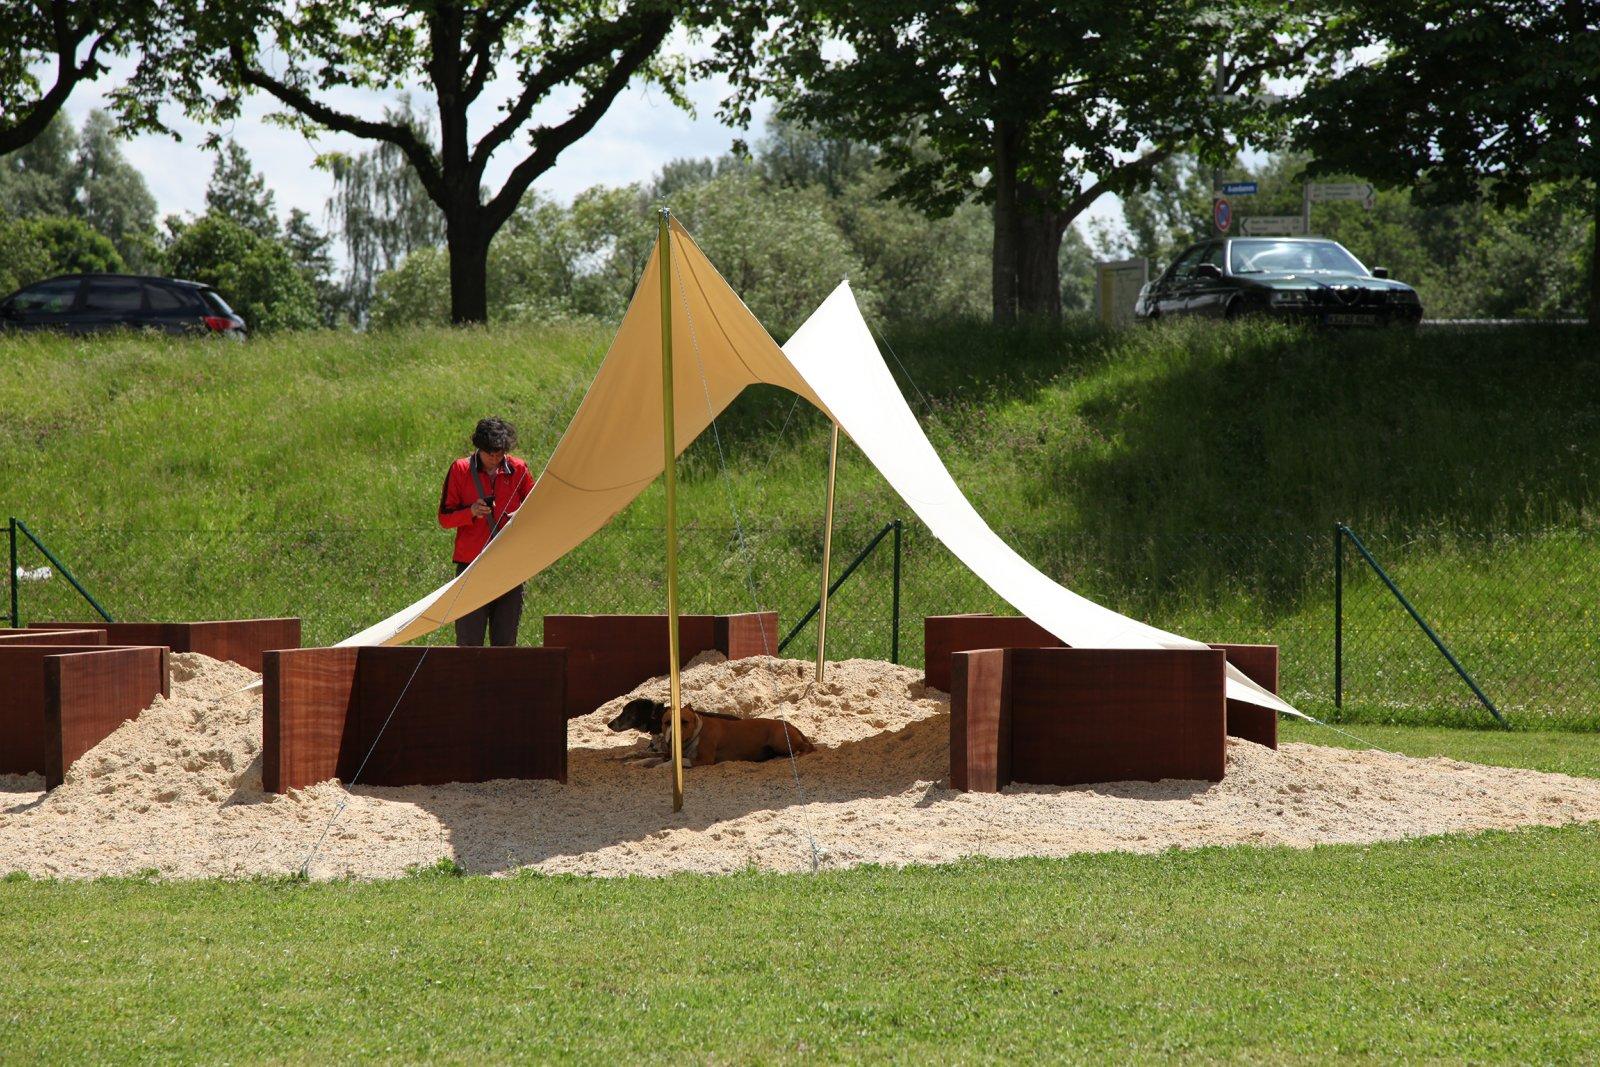 BrianJungen,Dog Run, 2012, mixed media, dimensionsvariable.Installation view,dOCUMENTA (13), Kassel, Germany,2012